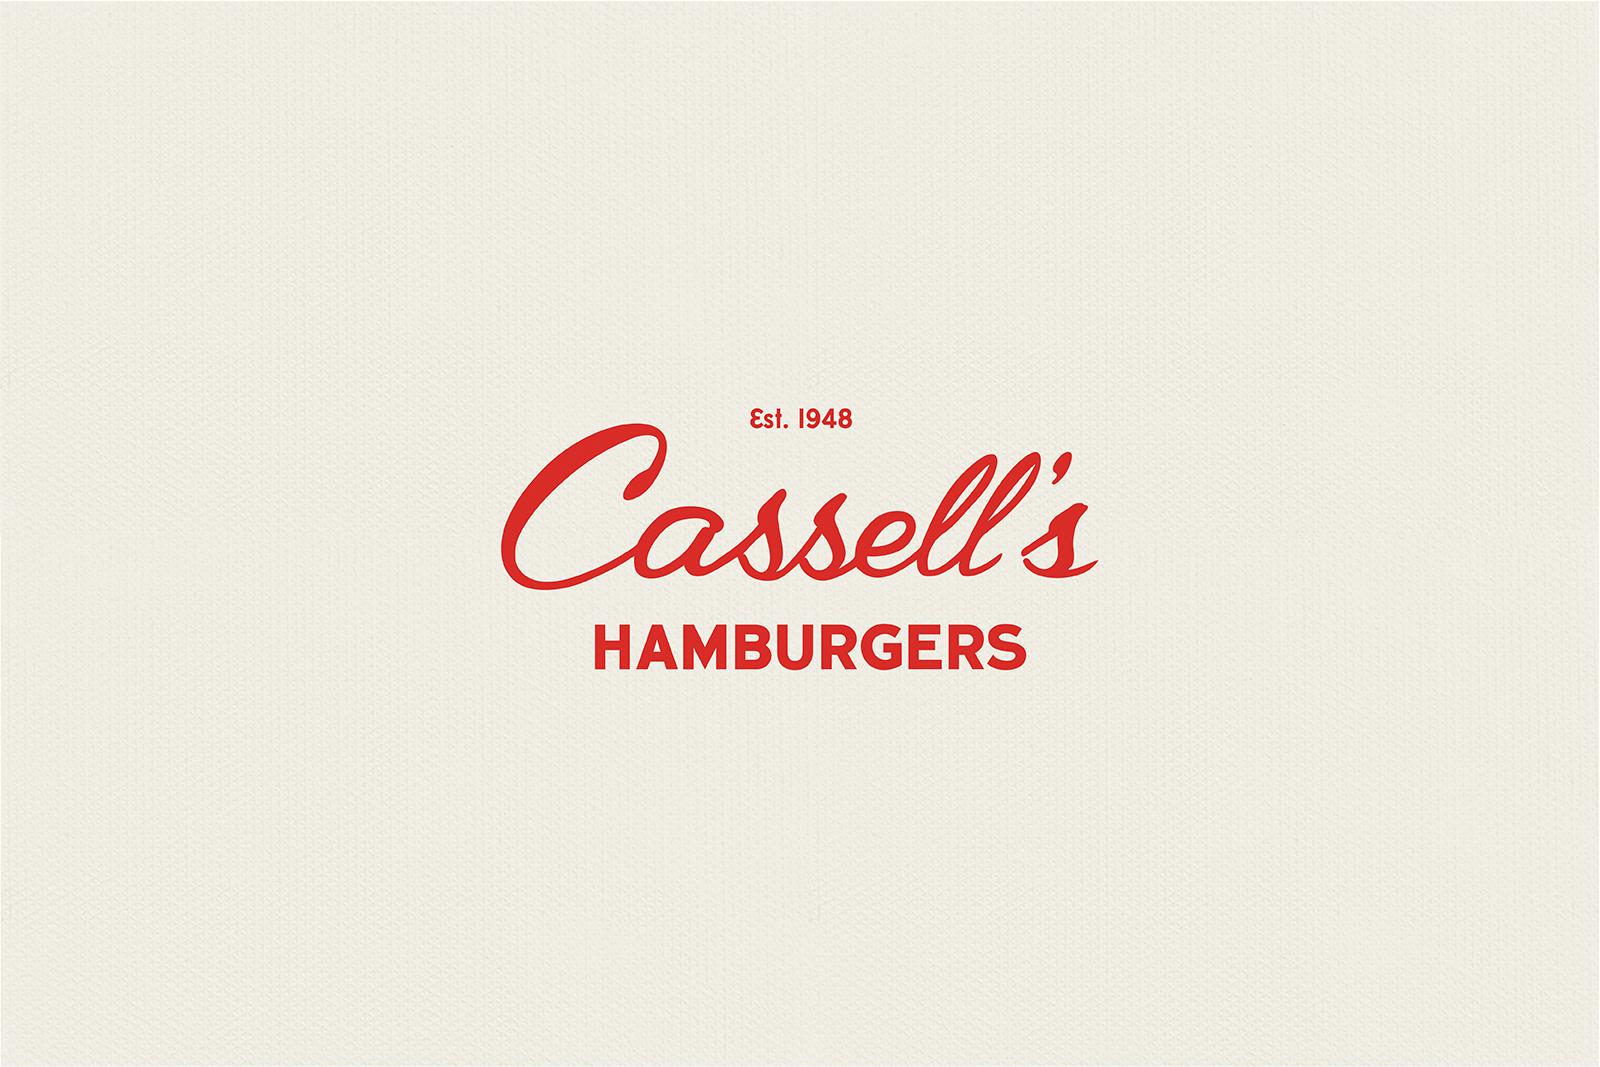 Cassells_Identity-02.jpg